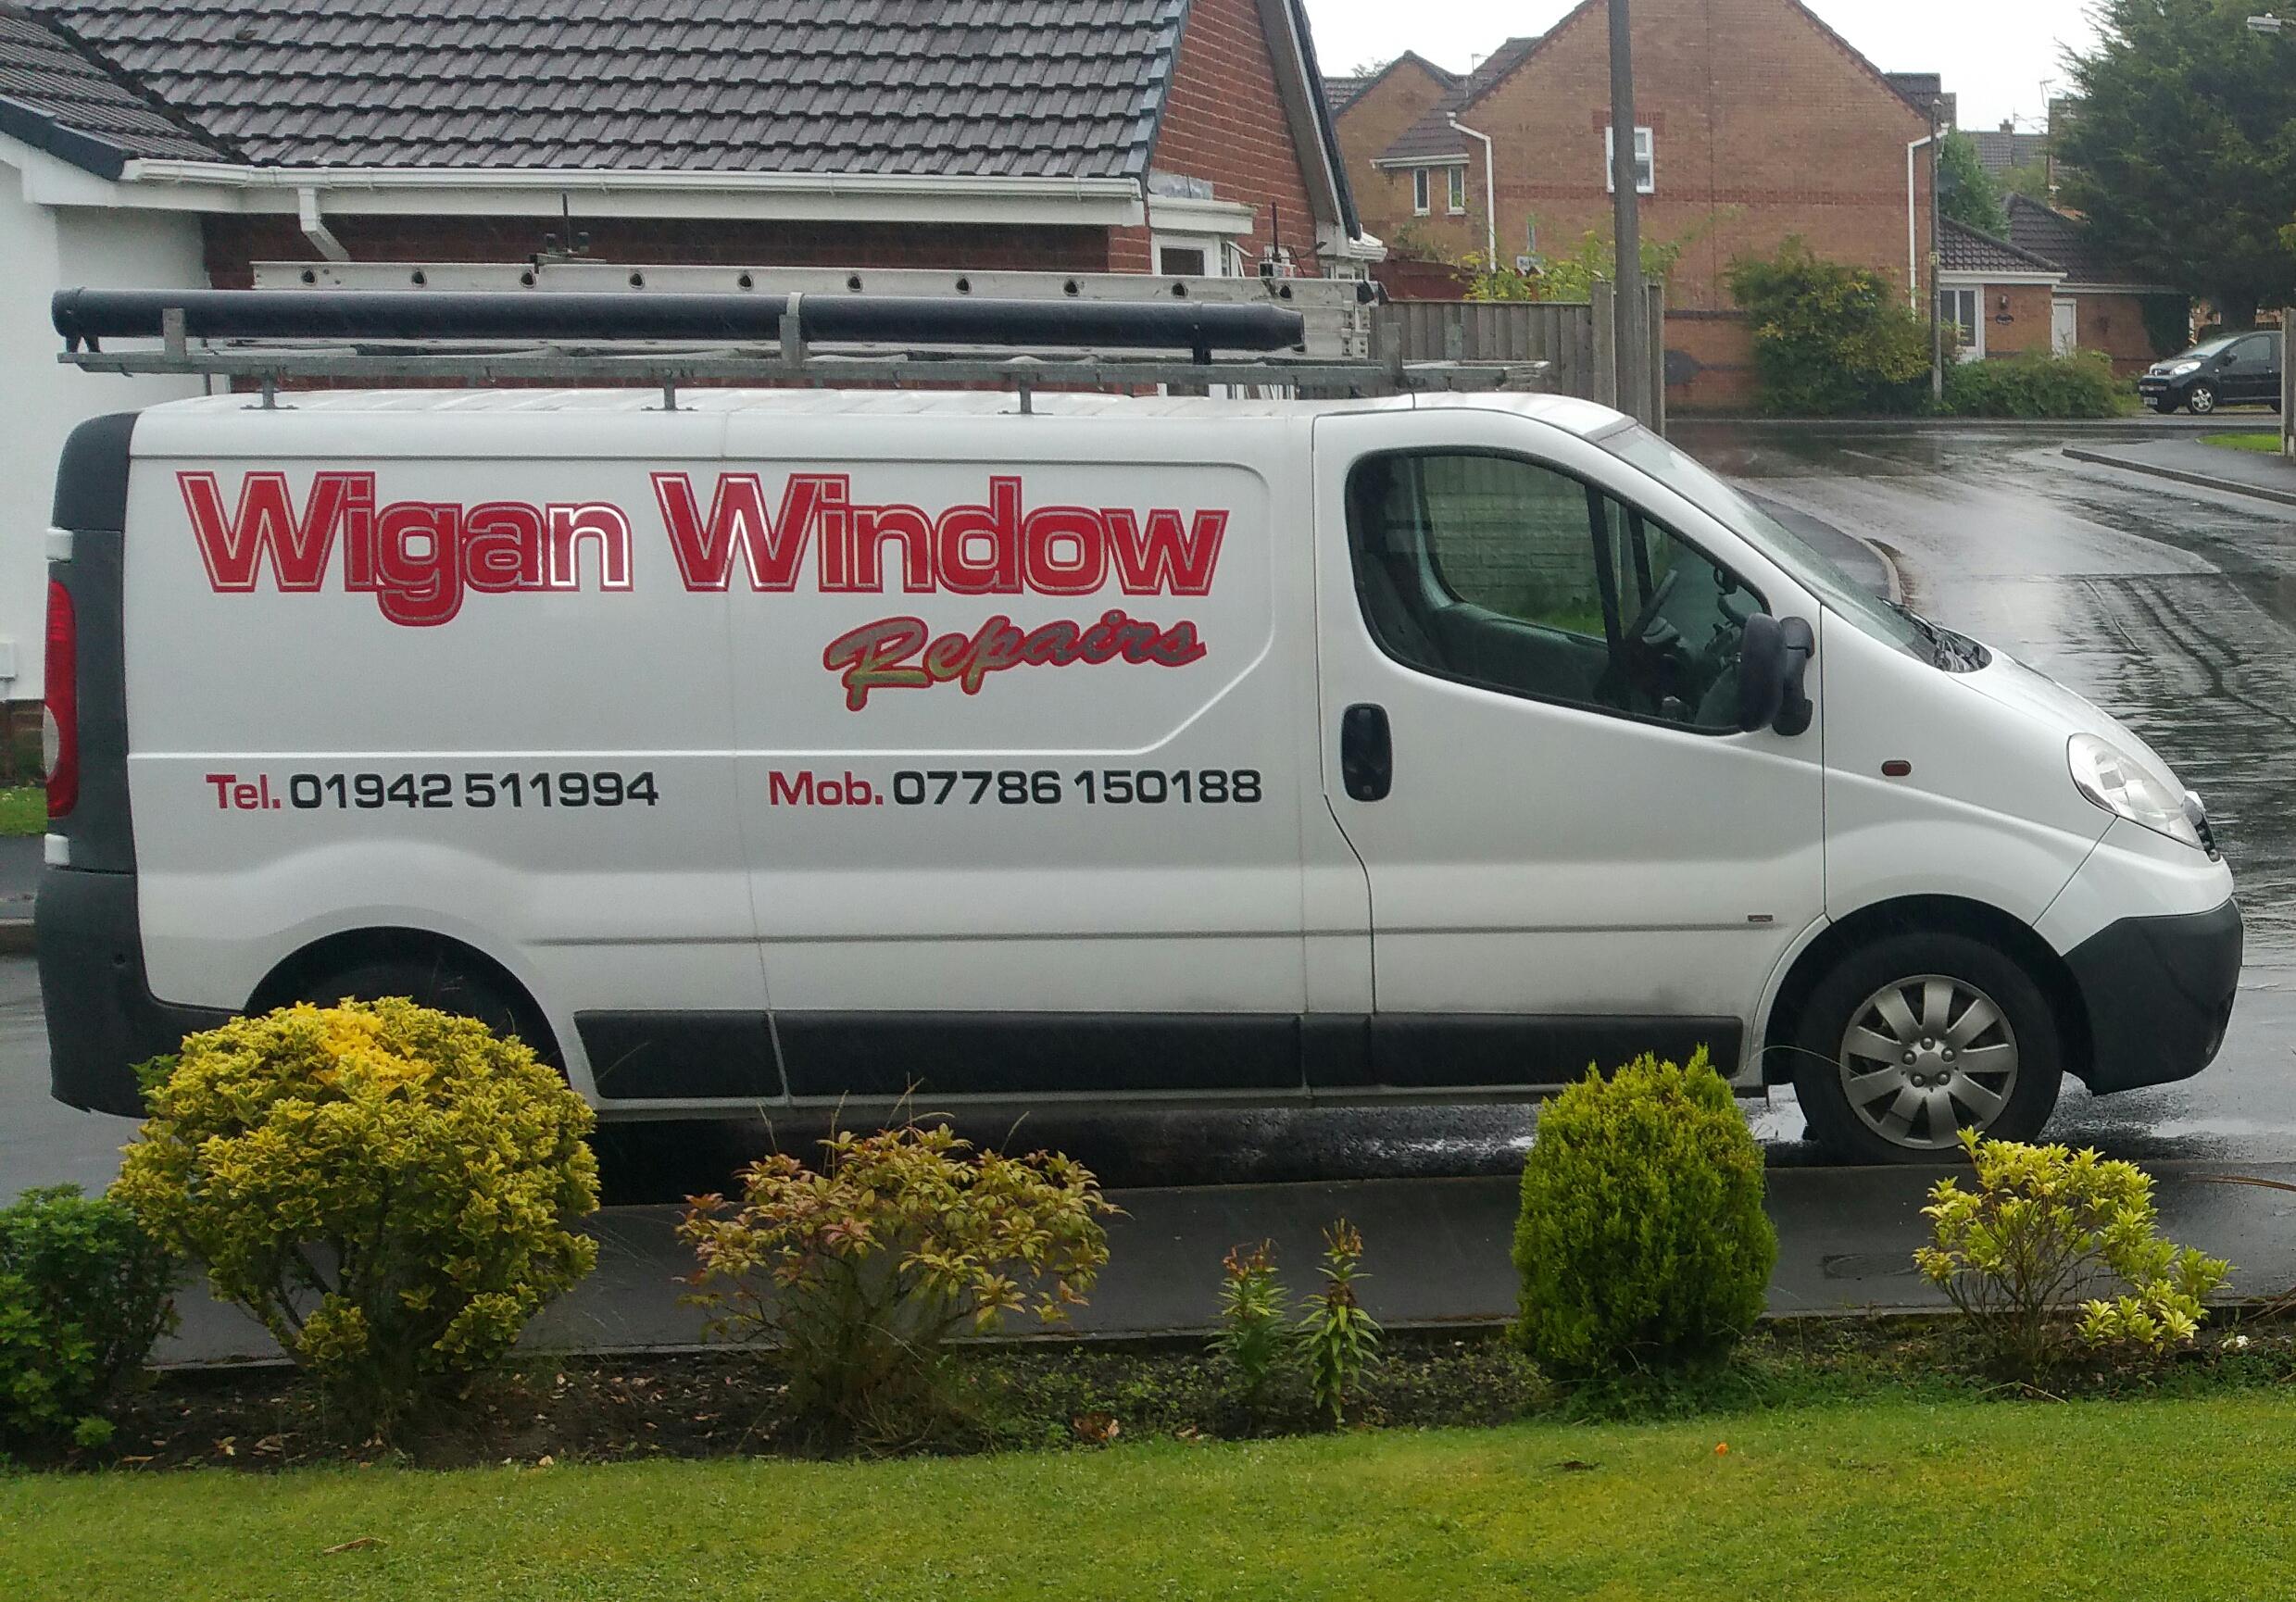 Wigan Window Repairs Van